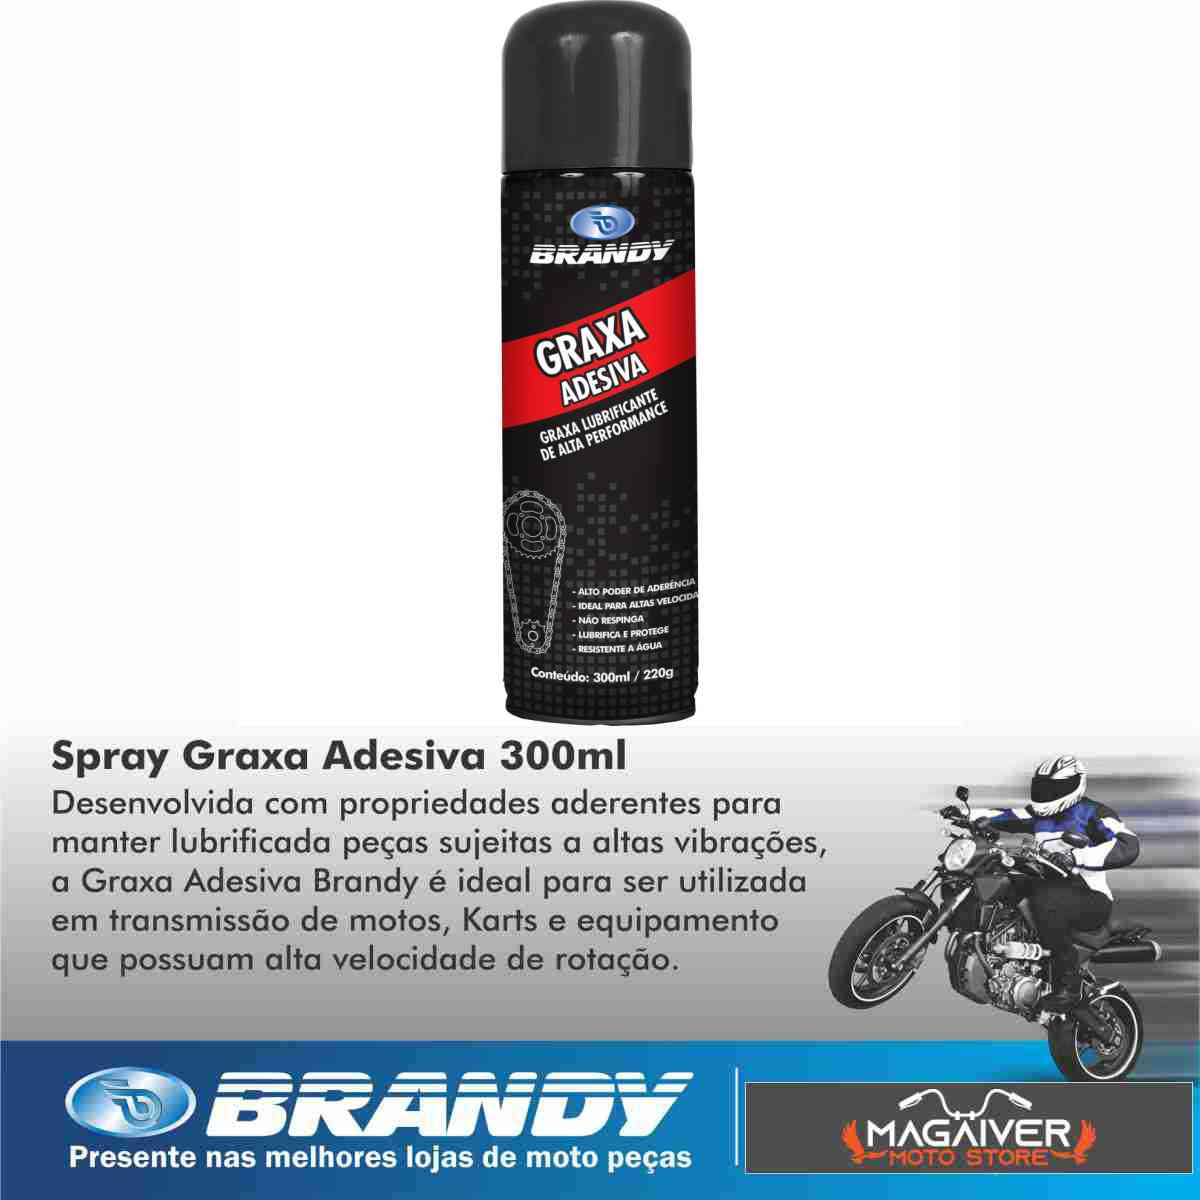 KIT 1 GRAXA ADESIVA MOTO BRANDY DE ALTA + 1 LIMPADOR CORRENTE E MOTOR 300ml + 2 REPARADOR PNEU 190ml